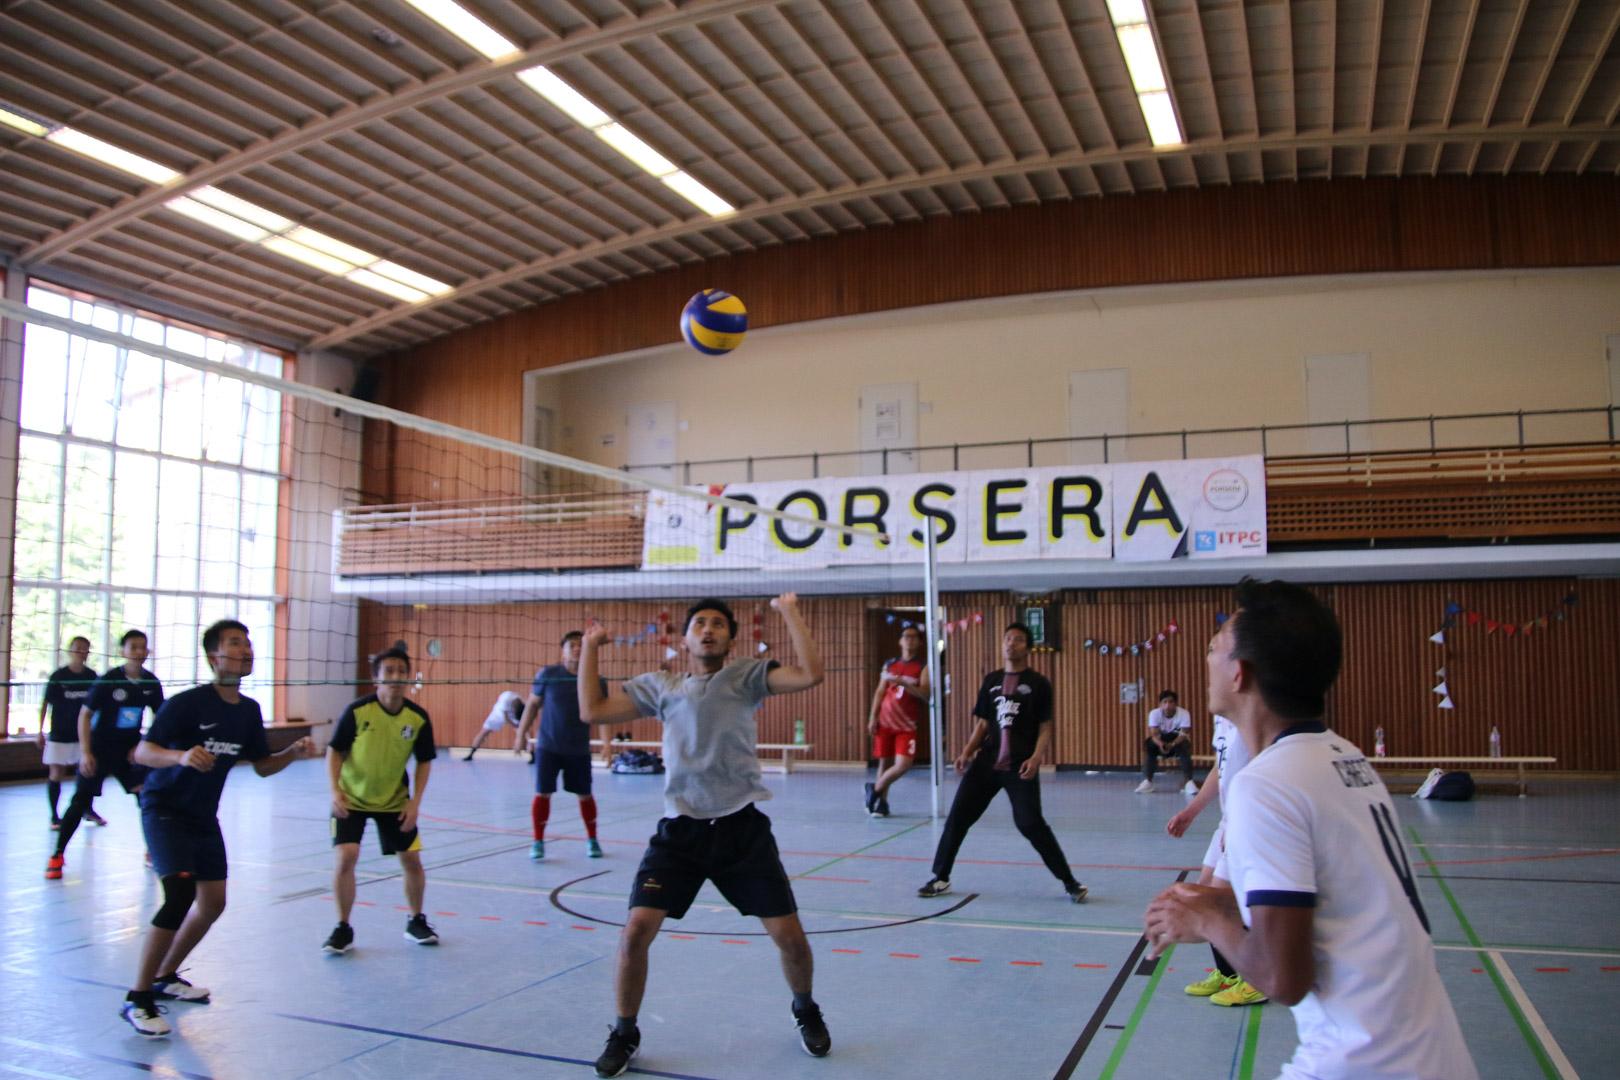 PORSERA_144